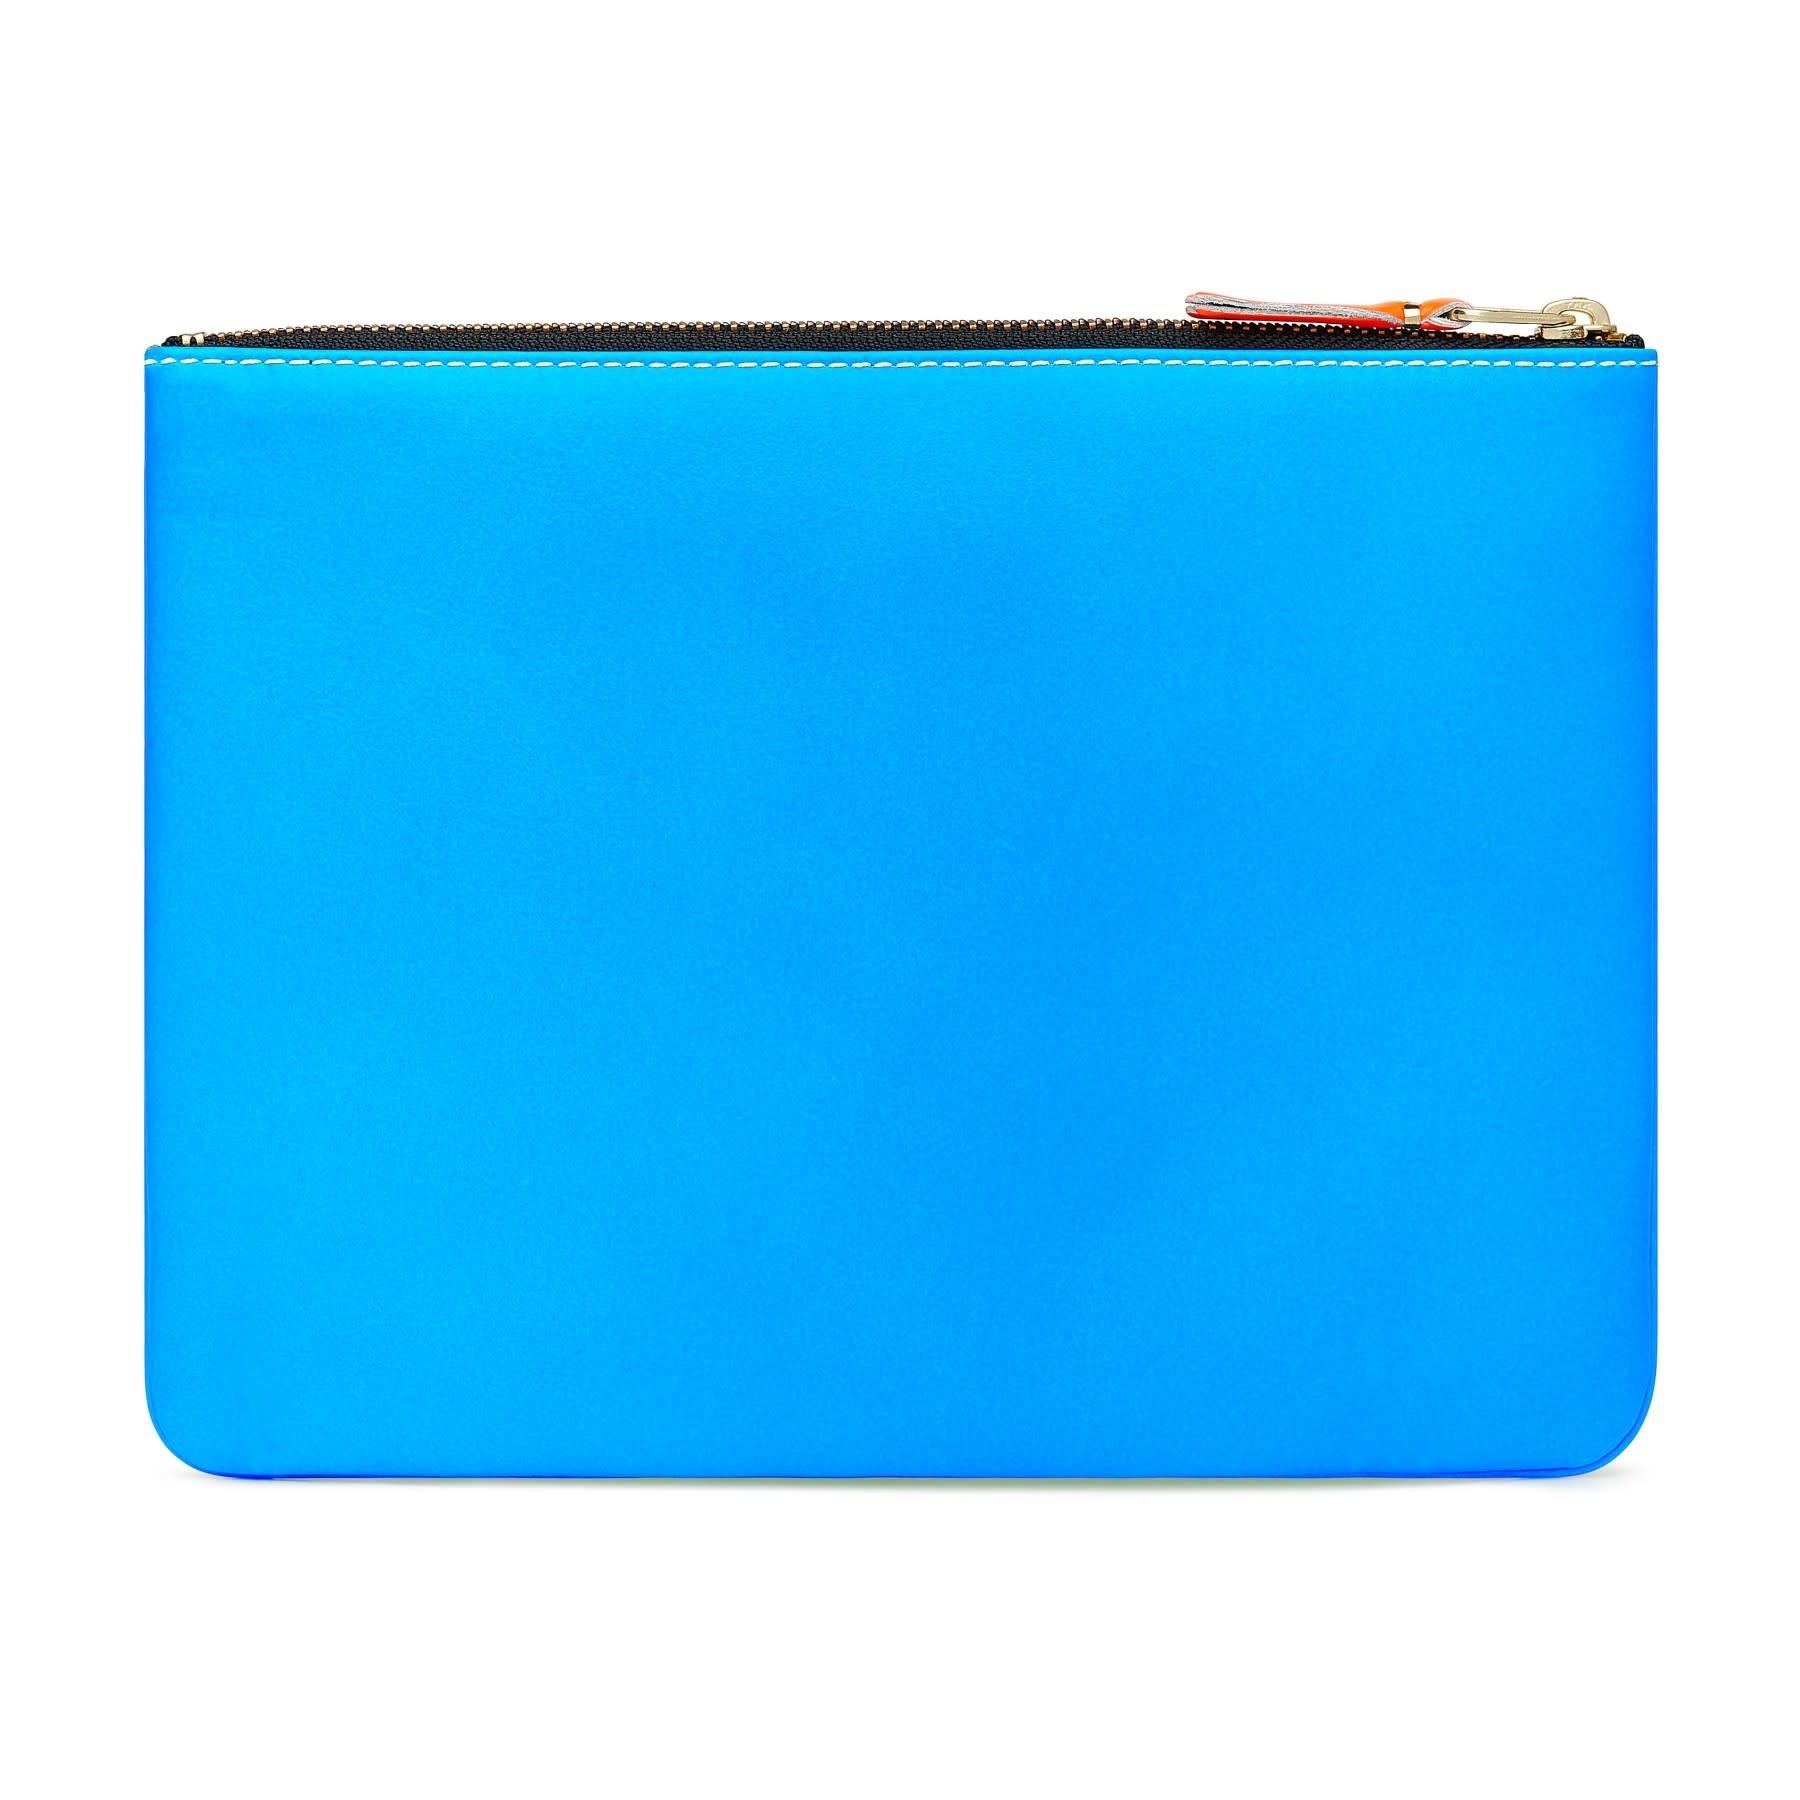 COMME des GARÇONS Wallet Super Fluo Pouch Neon Green/BLue  SA5100SF